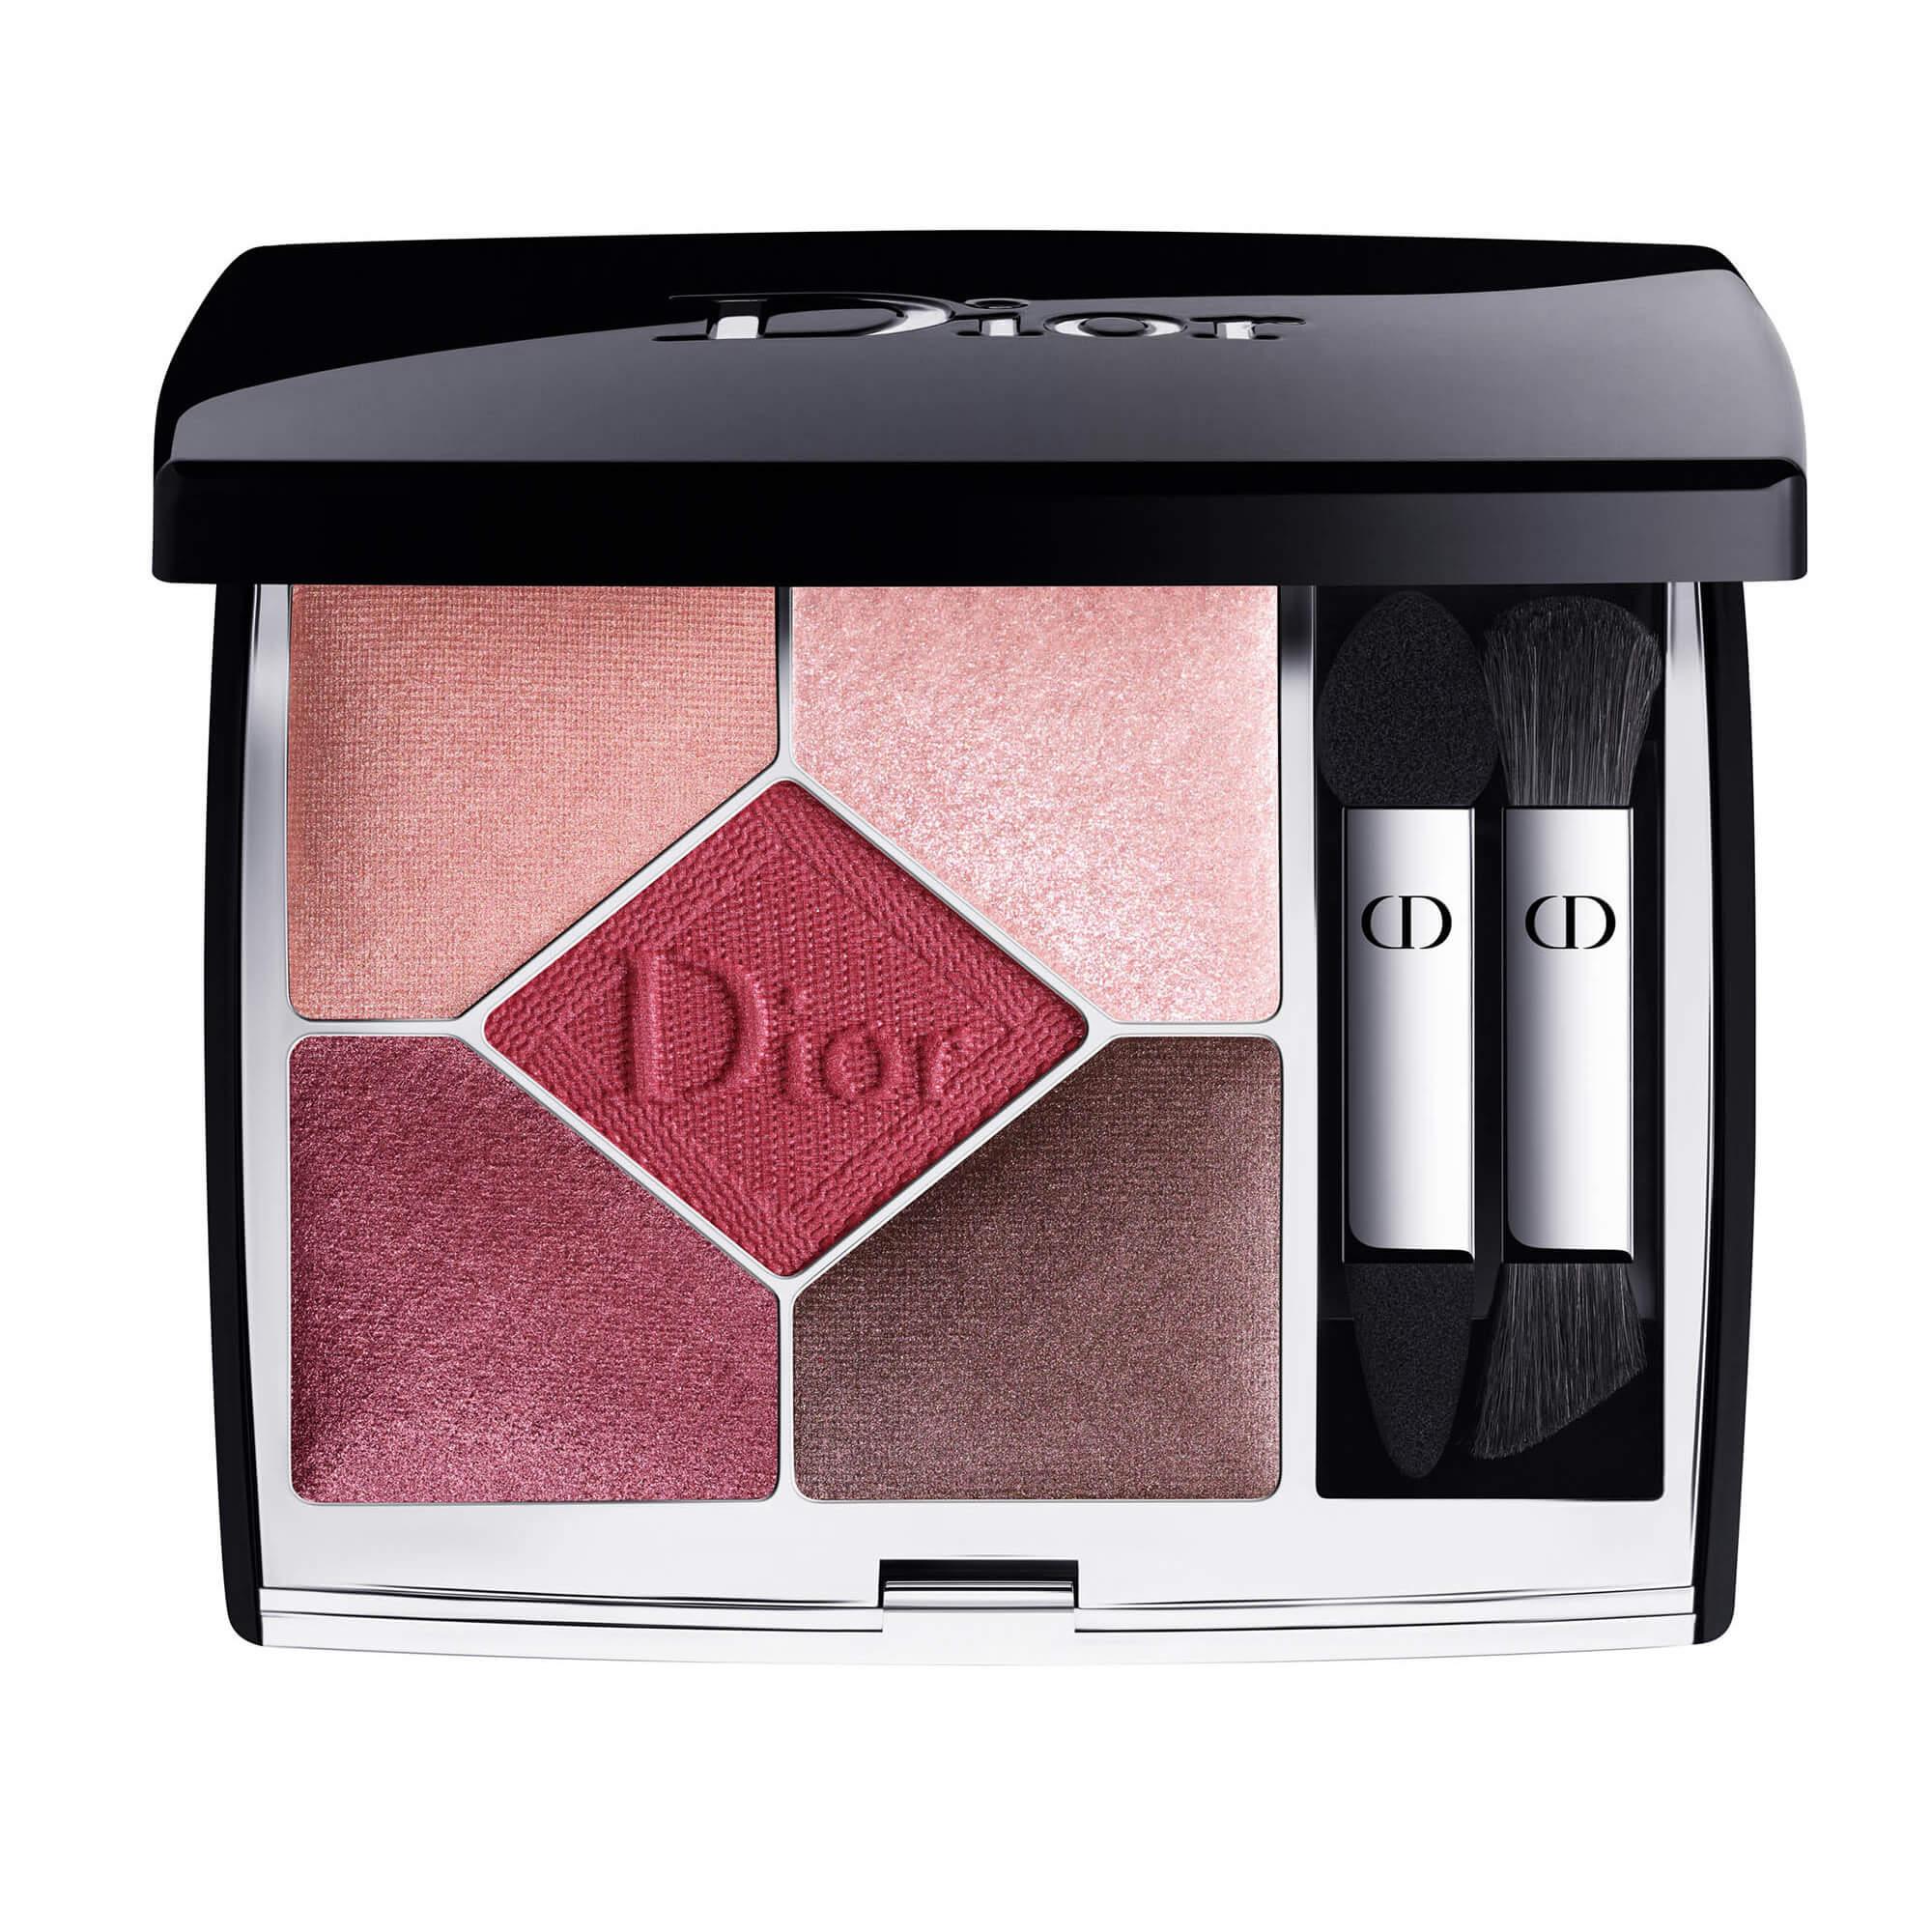 Dior 高級訂製五色眼影 (#879)HK$550 每款眼影組合的靈感皆源自著名的Dior時裝天橋造型,於全新眼影盒中帶來煥然一新的色調及妝效。備有6種全新妝效:啞緻、緞光、珠光、金屬、閃爍及光影,以及14款由Peter Philips創作的色彩組合,塑造出一系列與經典時裝天橋造型相對應,且易於使用及配搭的眼影色調。